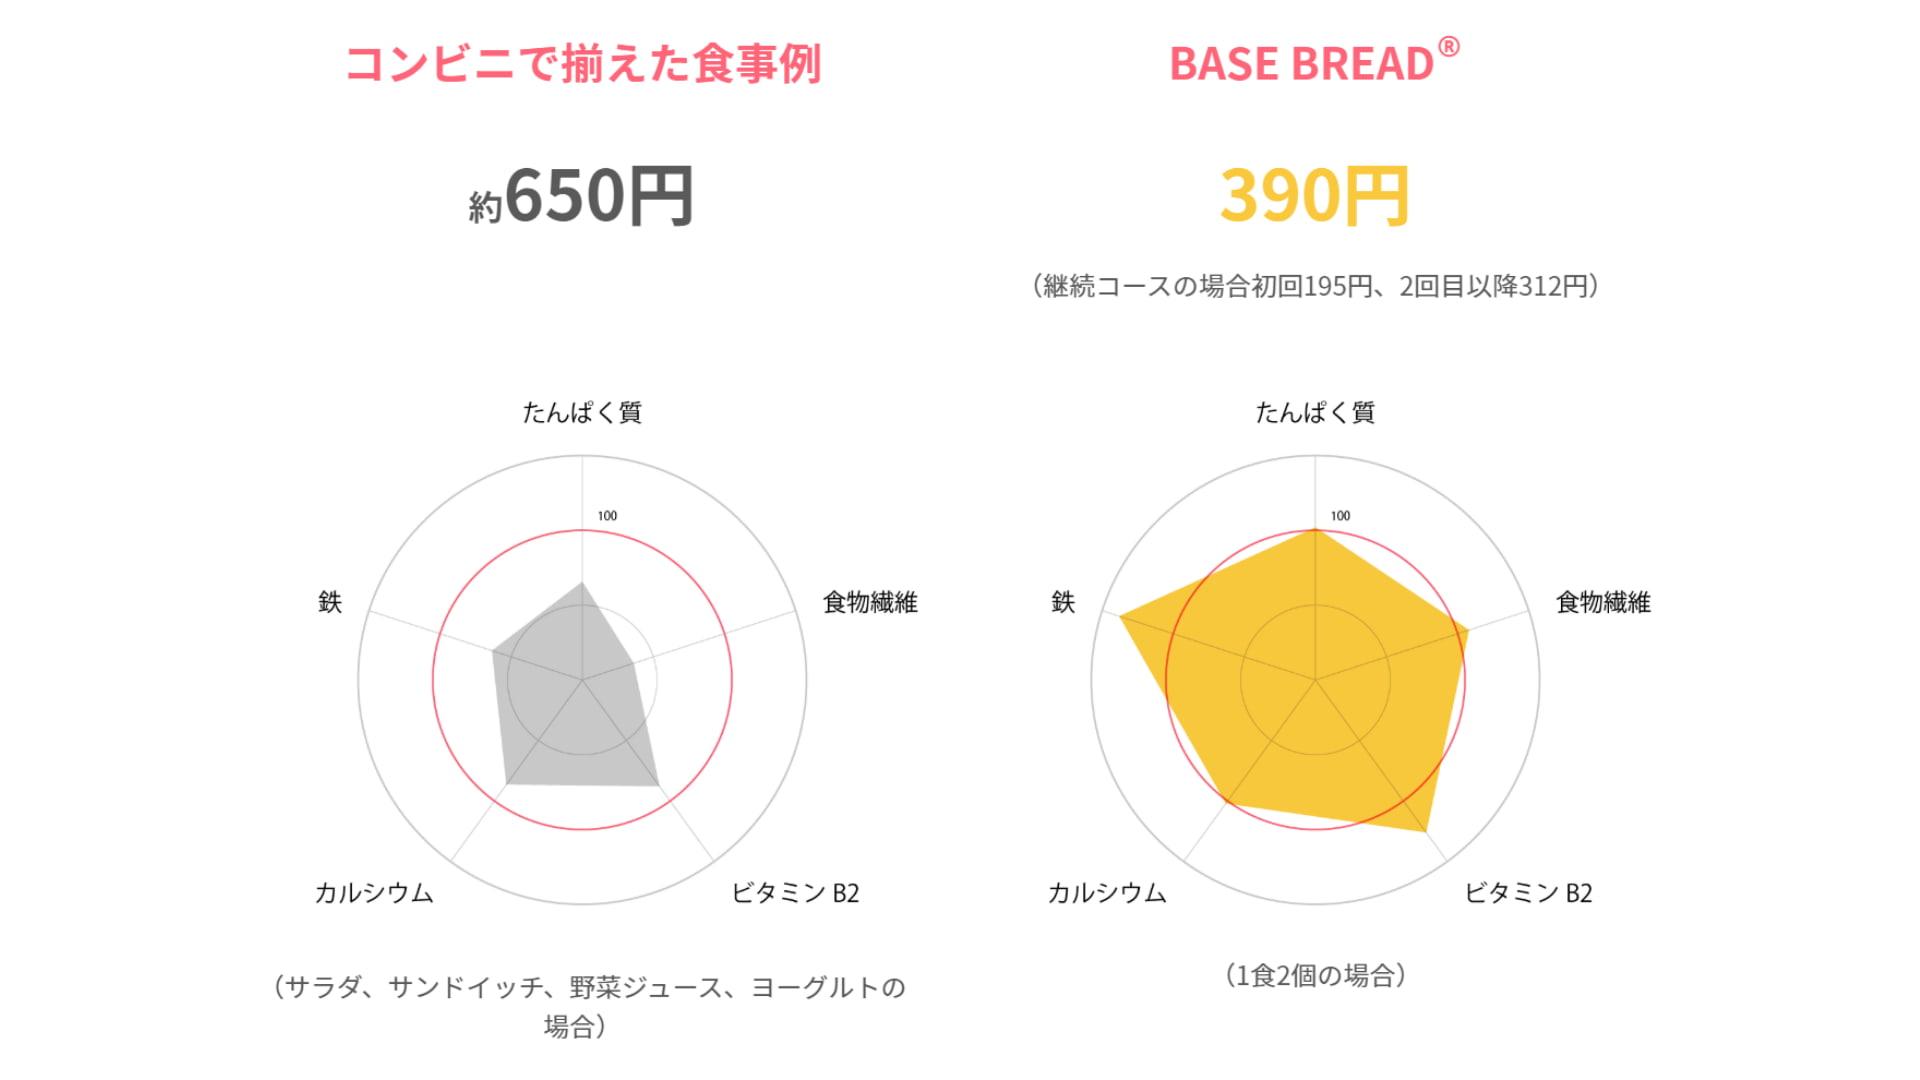 BASE BREAD(ベースブレッド)栄養素比較